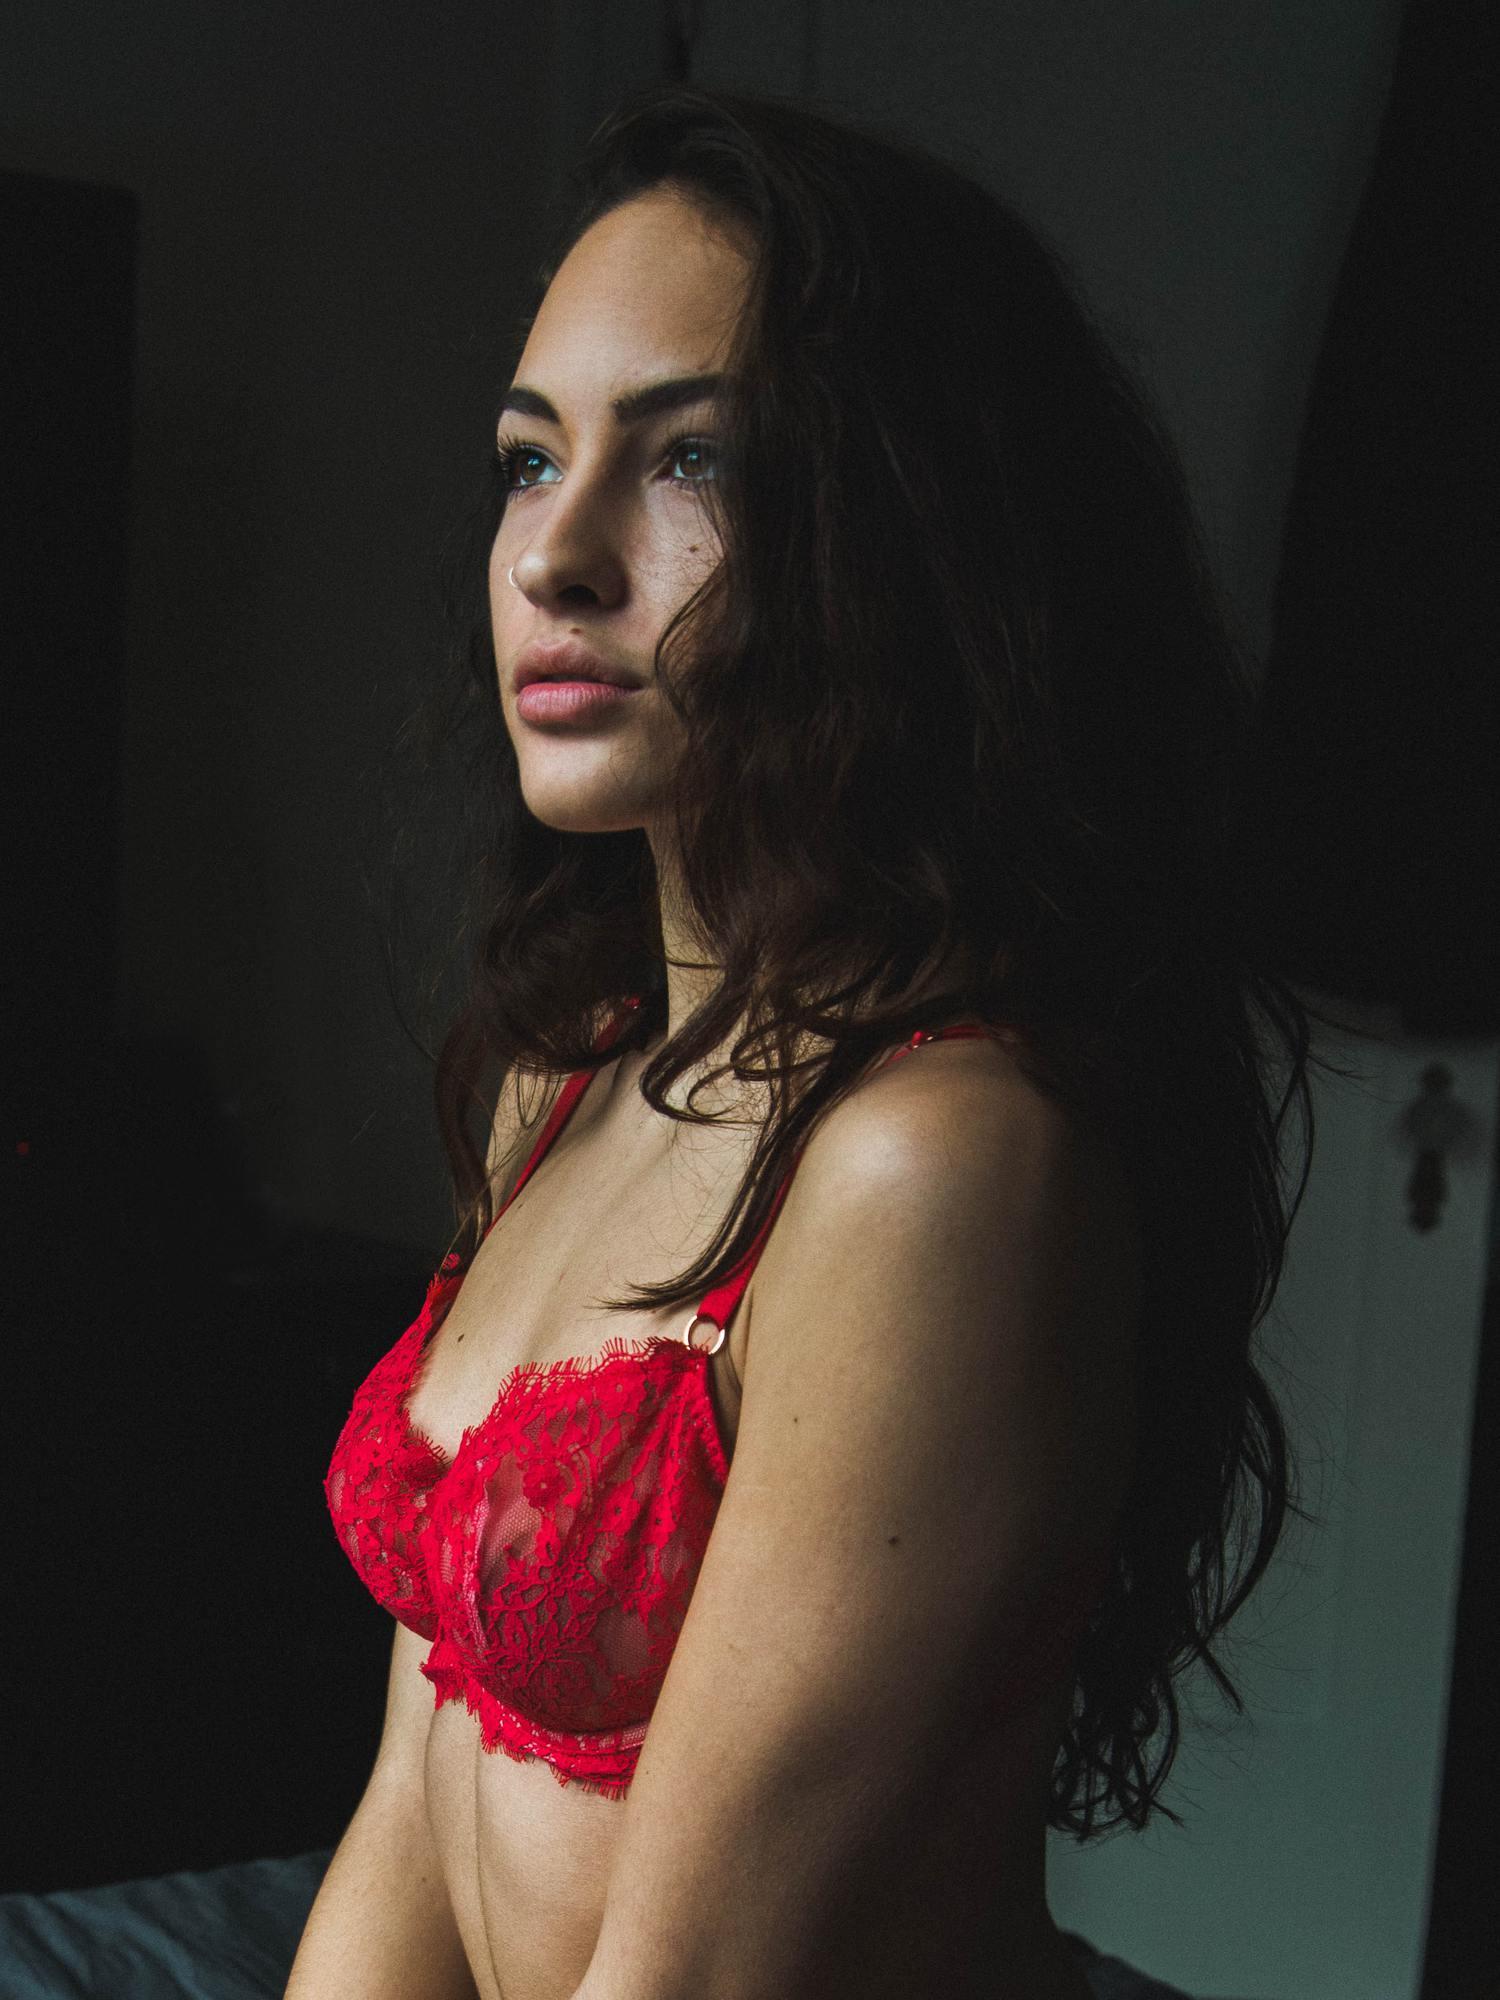 Retrato de mujer con lencería roja